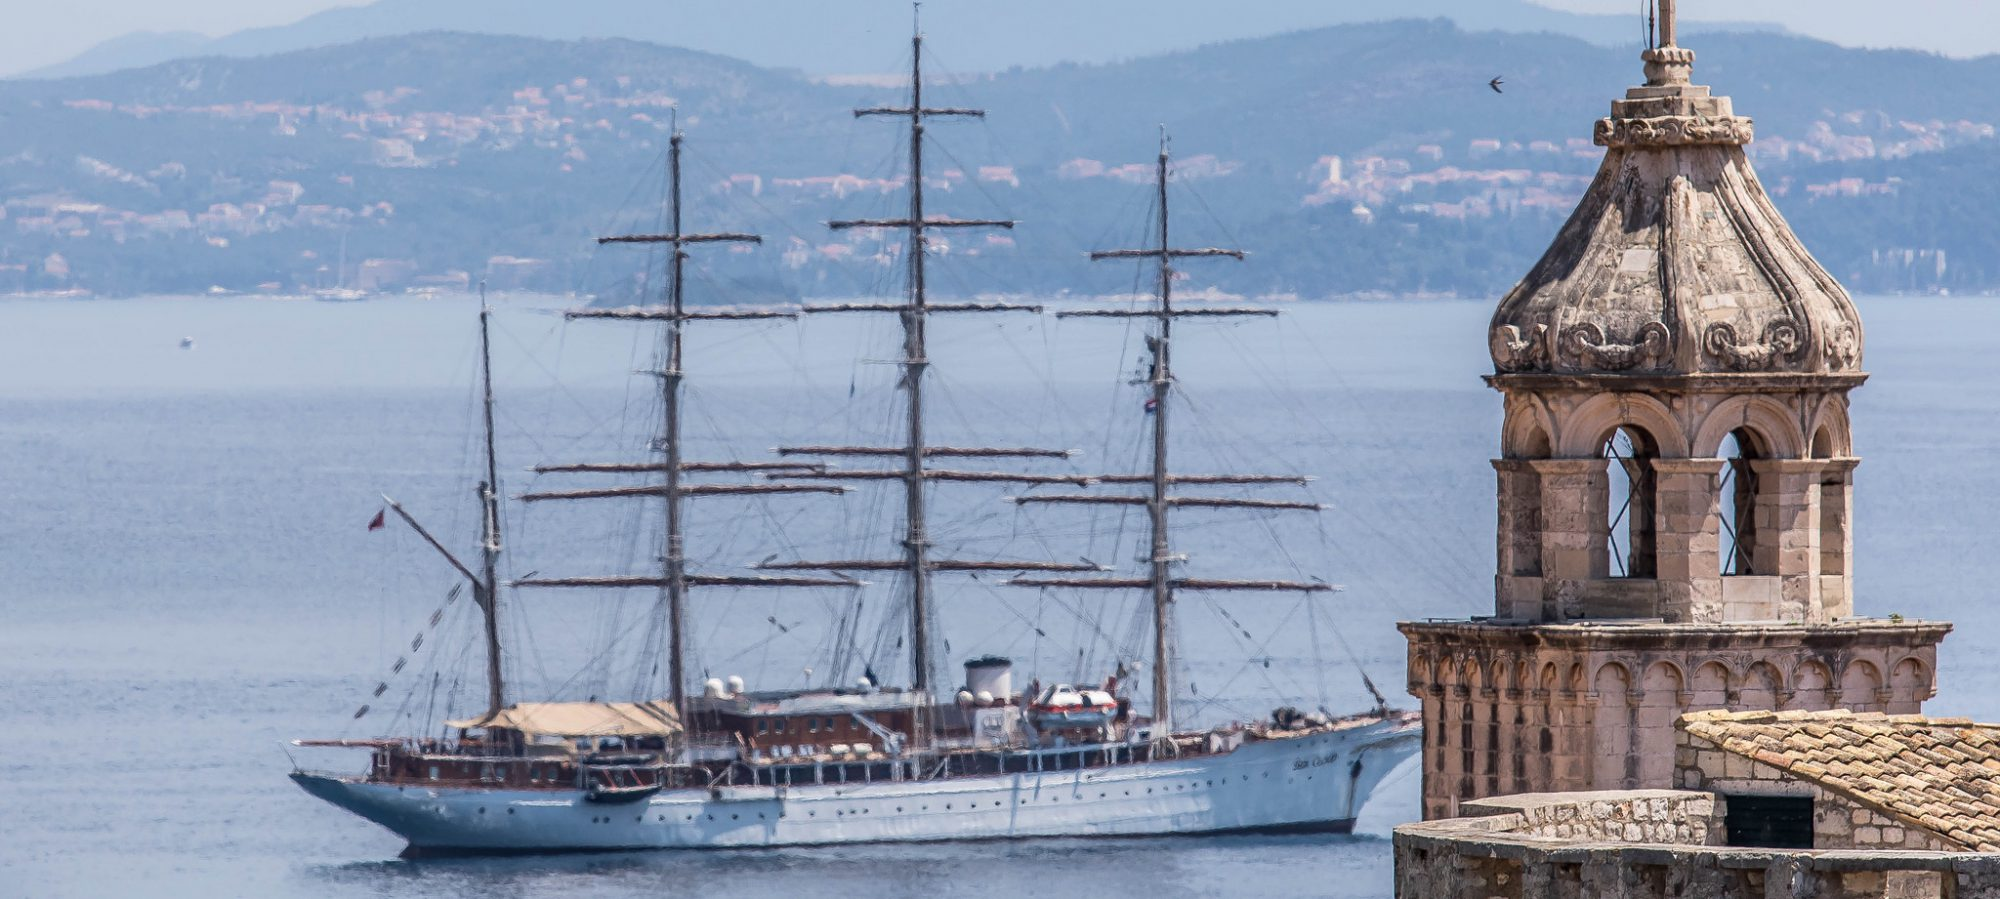 Secret Dalmatia – Croatia Travel Experiences